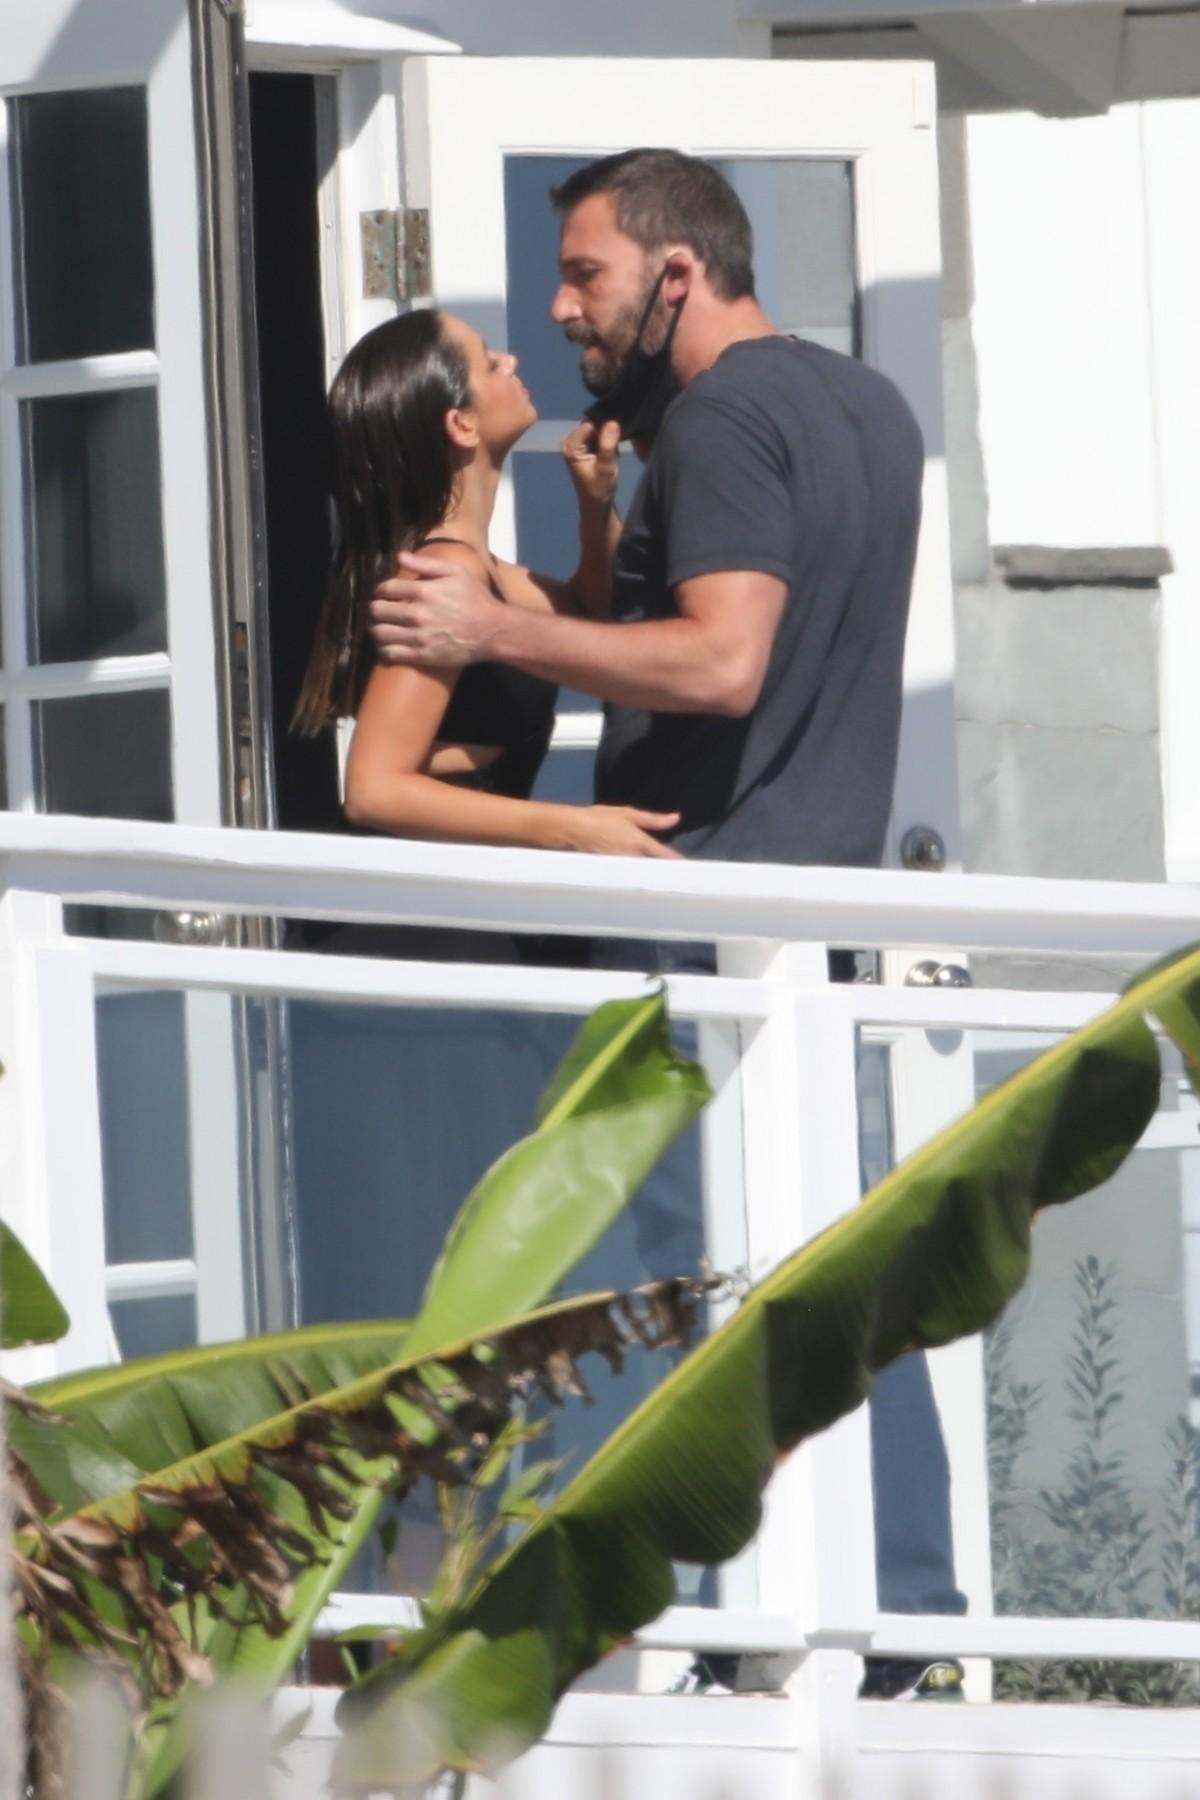 Ben Affleck's girlfriend Ana de Armas pulls down his mask for a kiss at a beach photoshoot